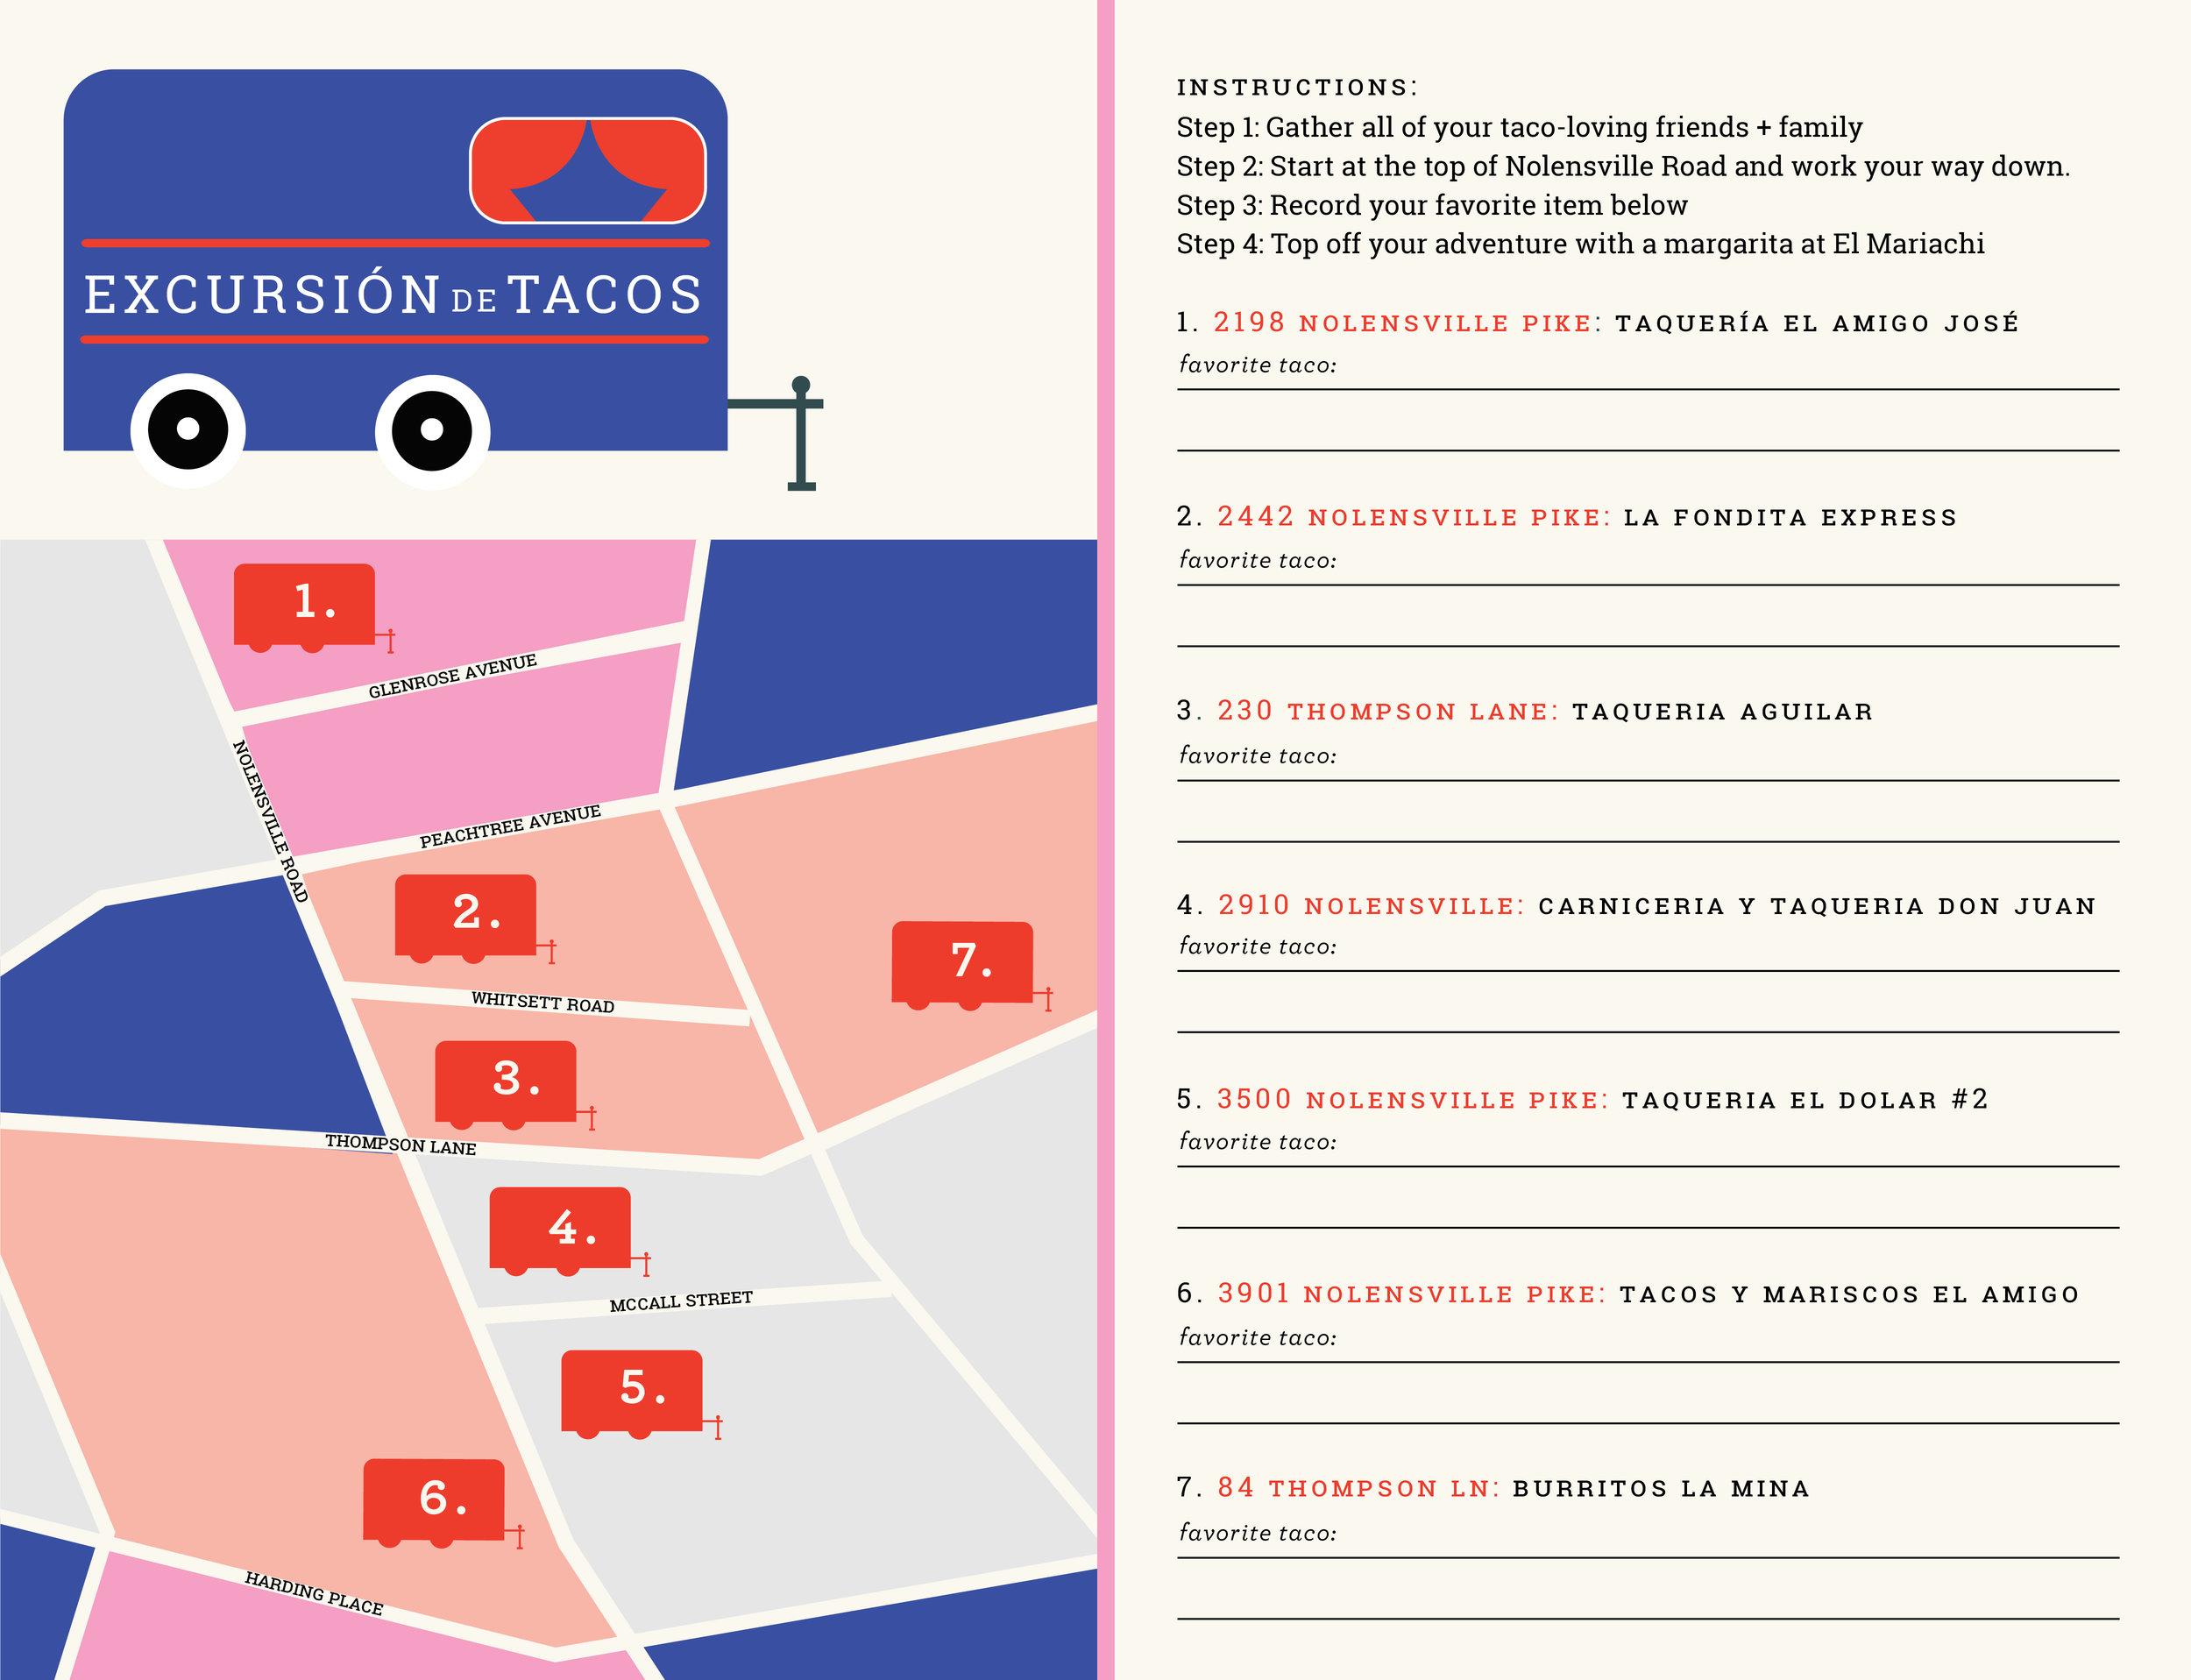 tacotruck-01.jpg